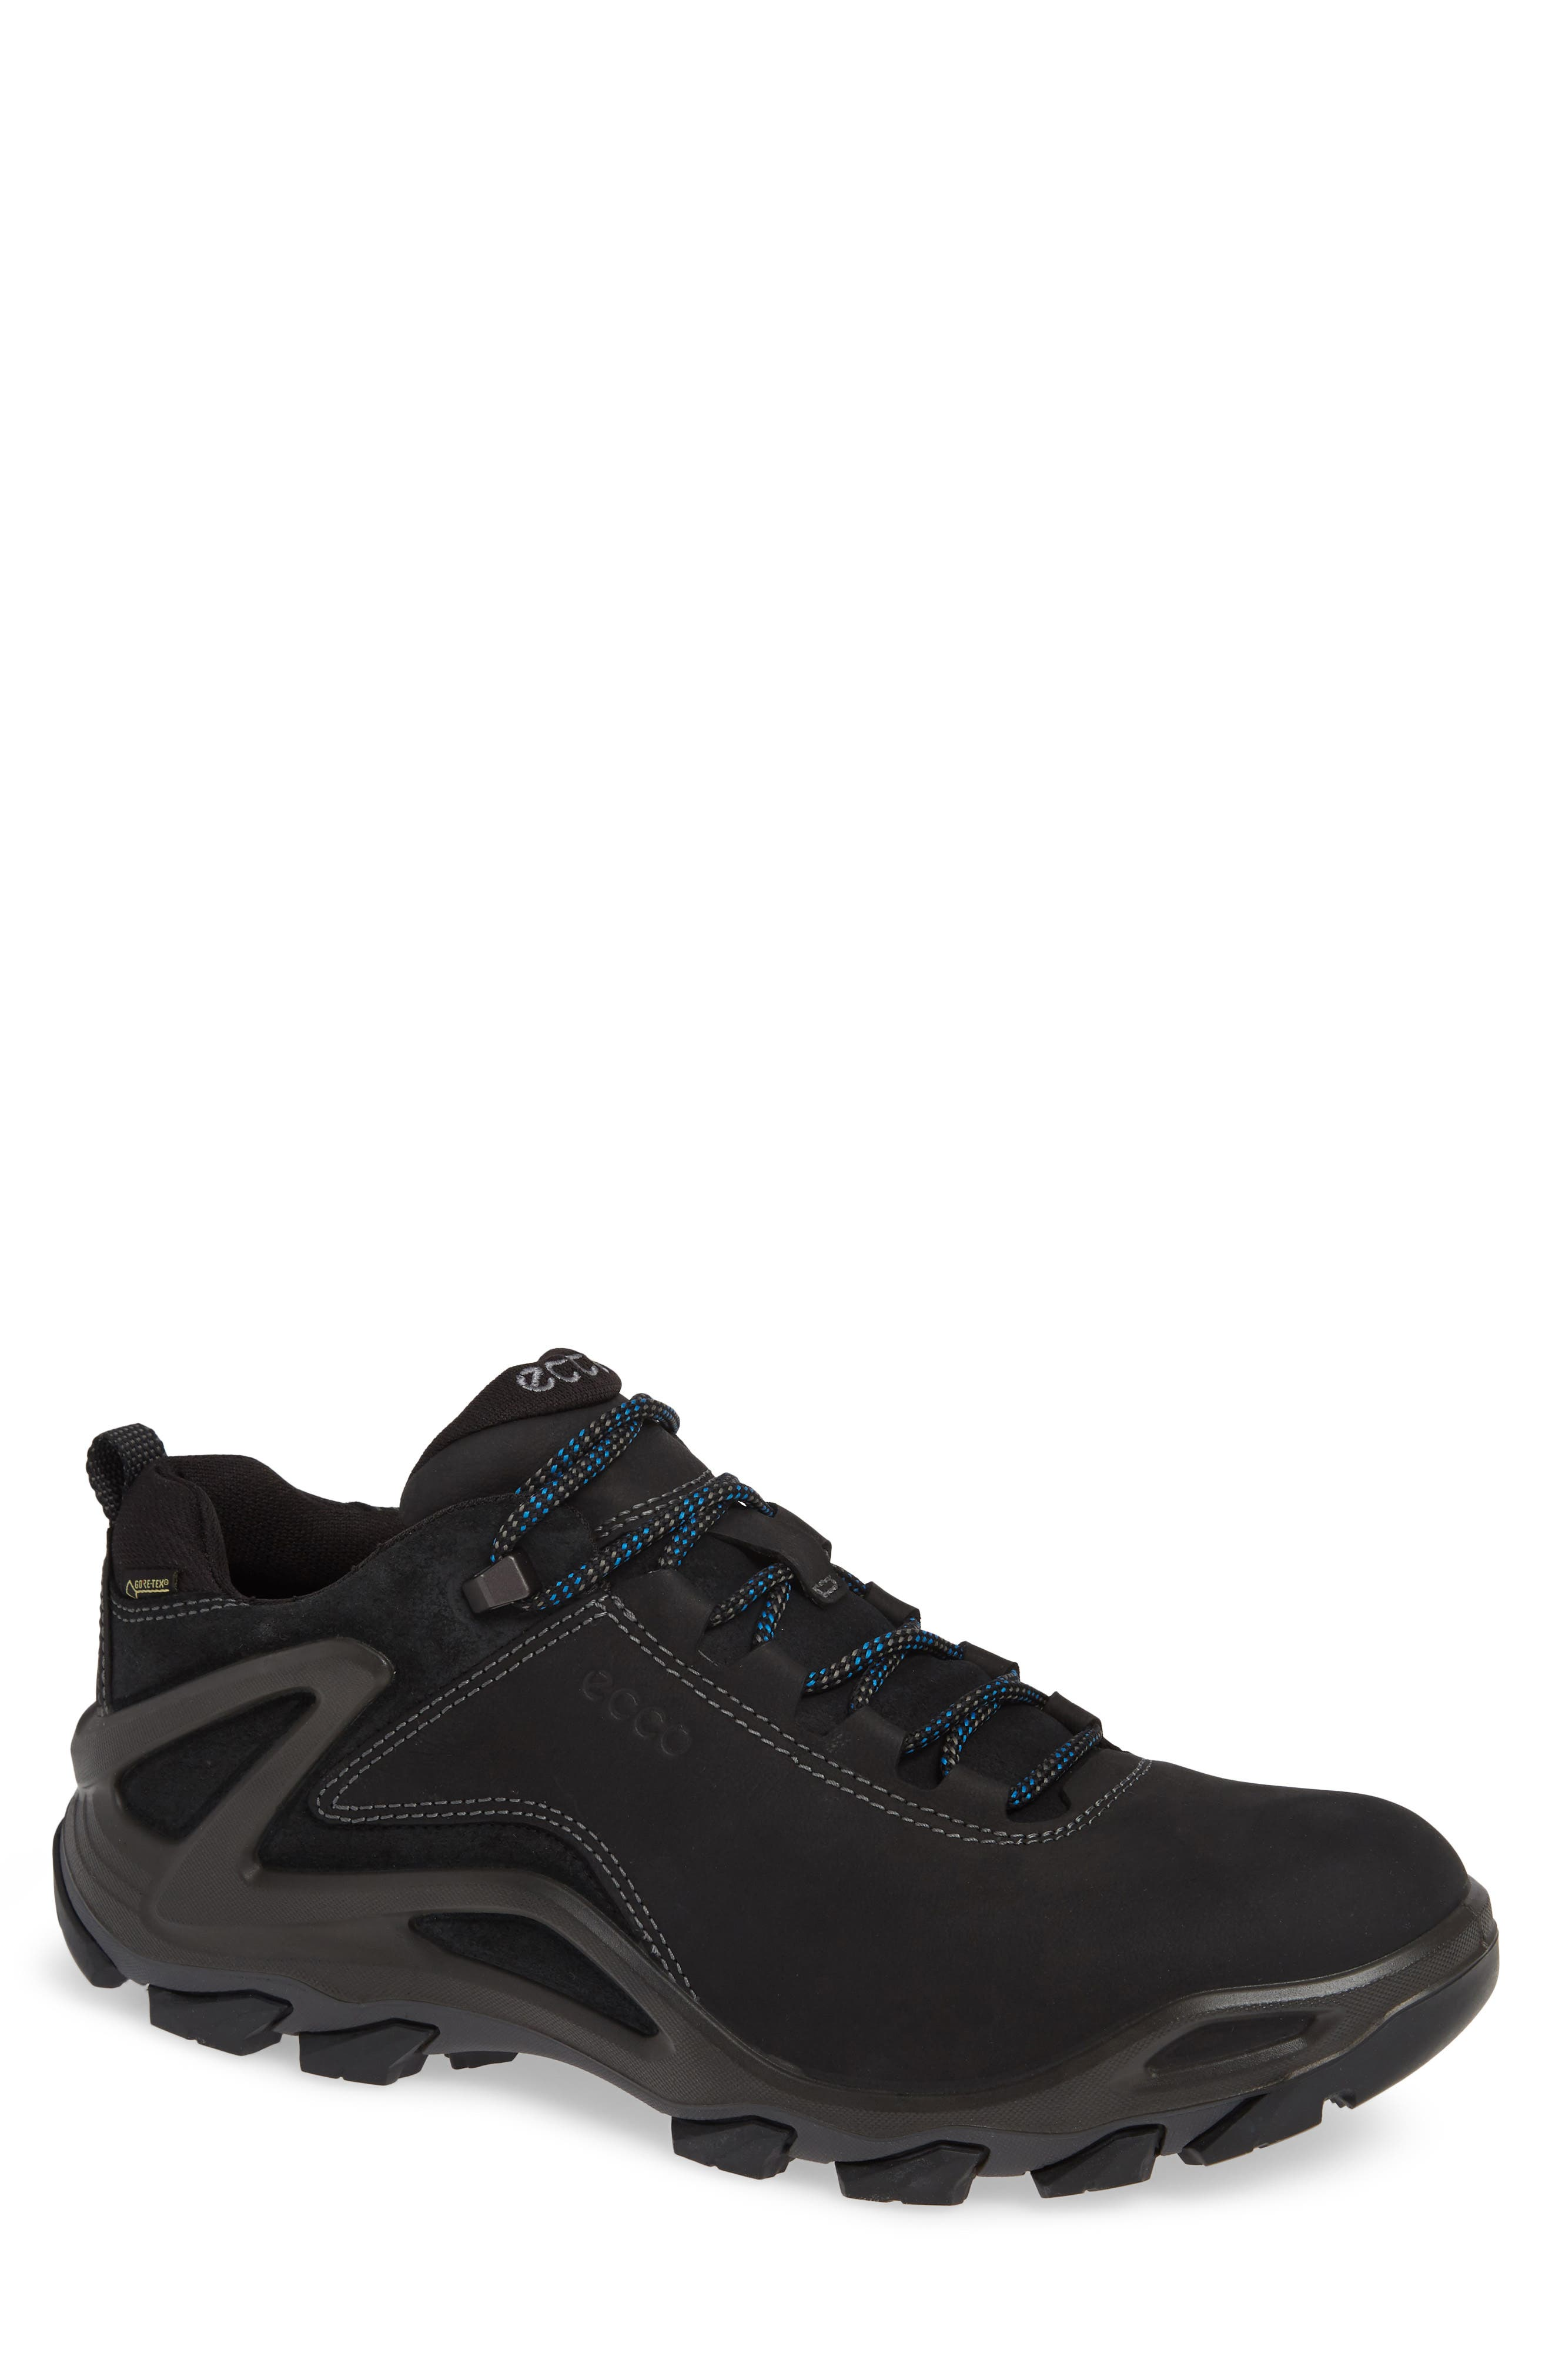 Terra Evo GTX Low Hiking Shoe,                         Main,                         color, 009